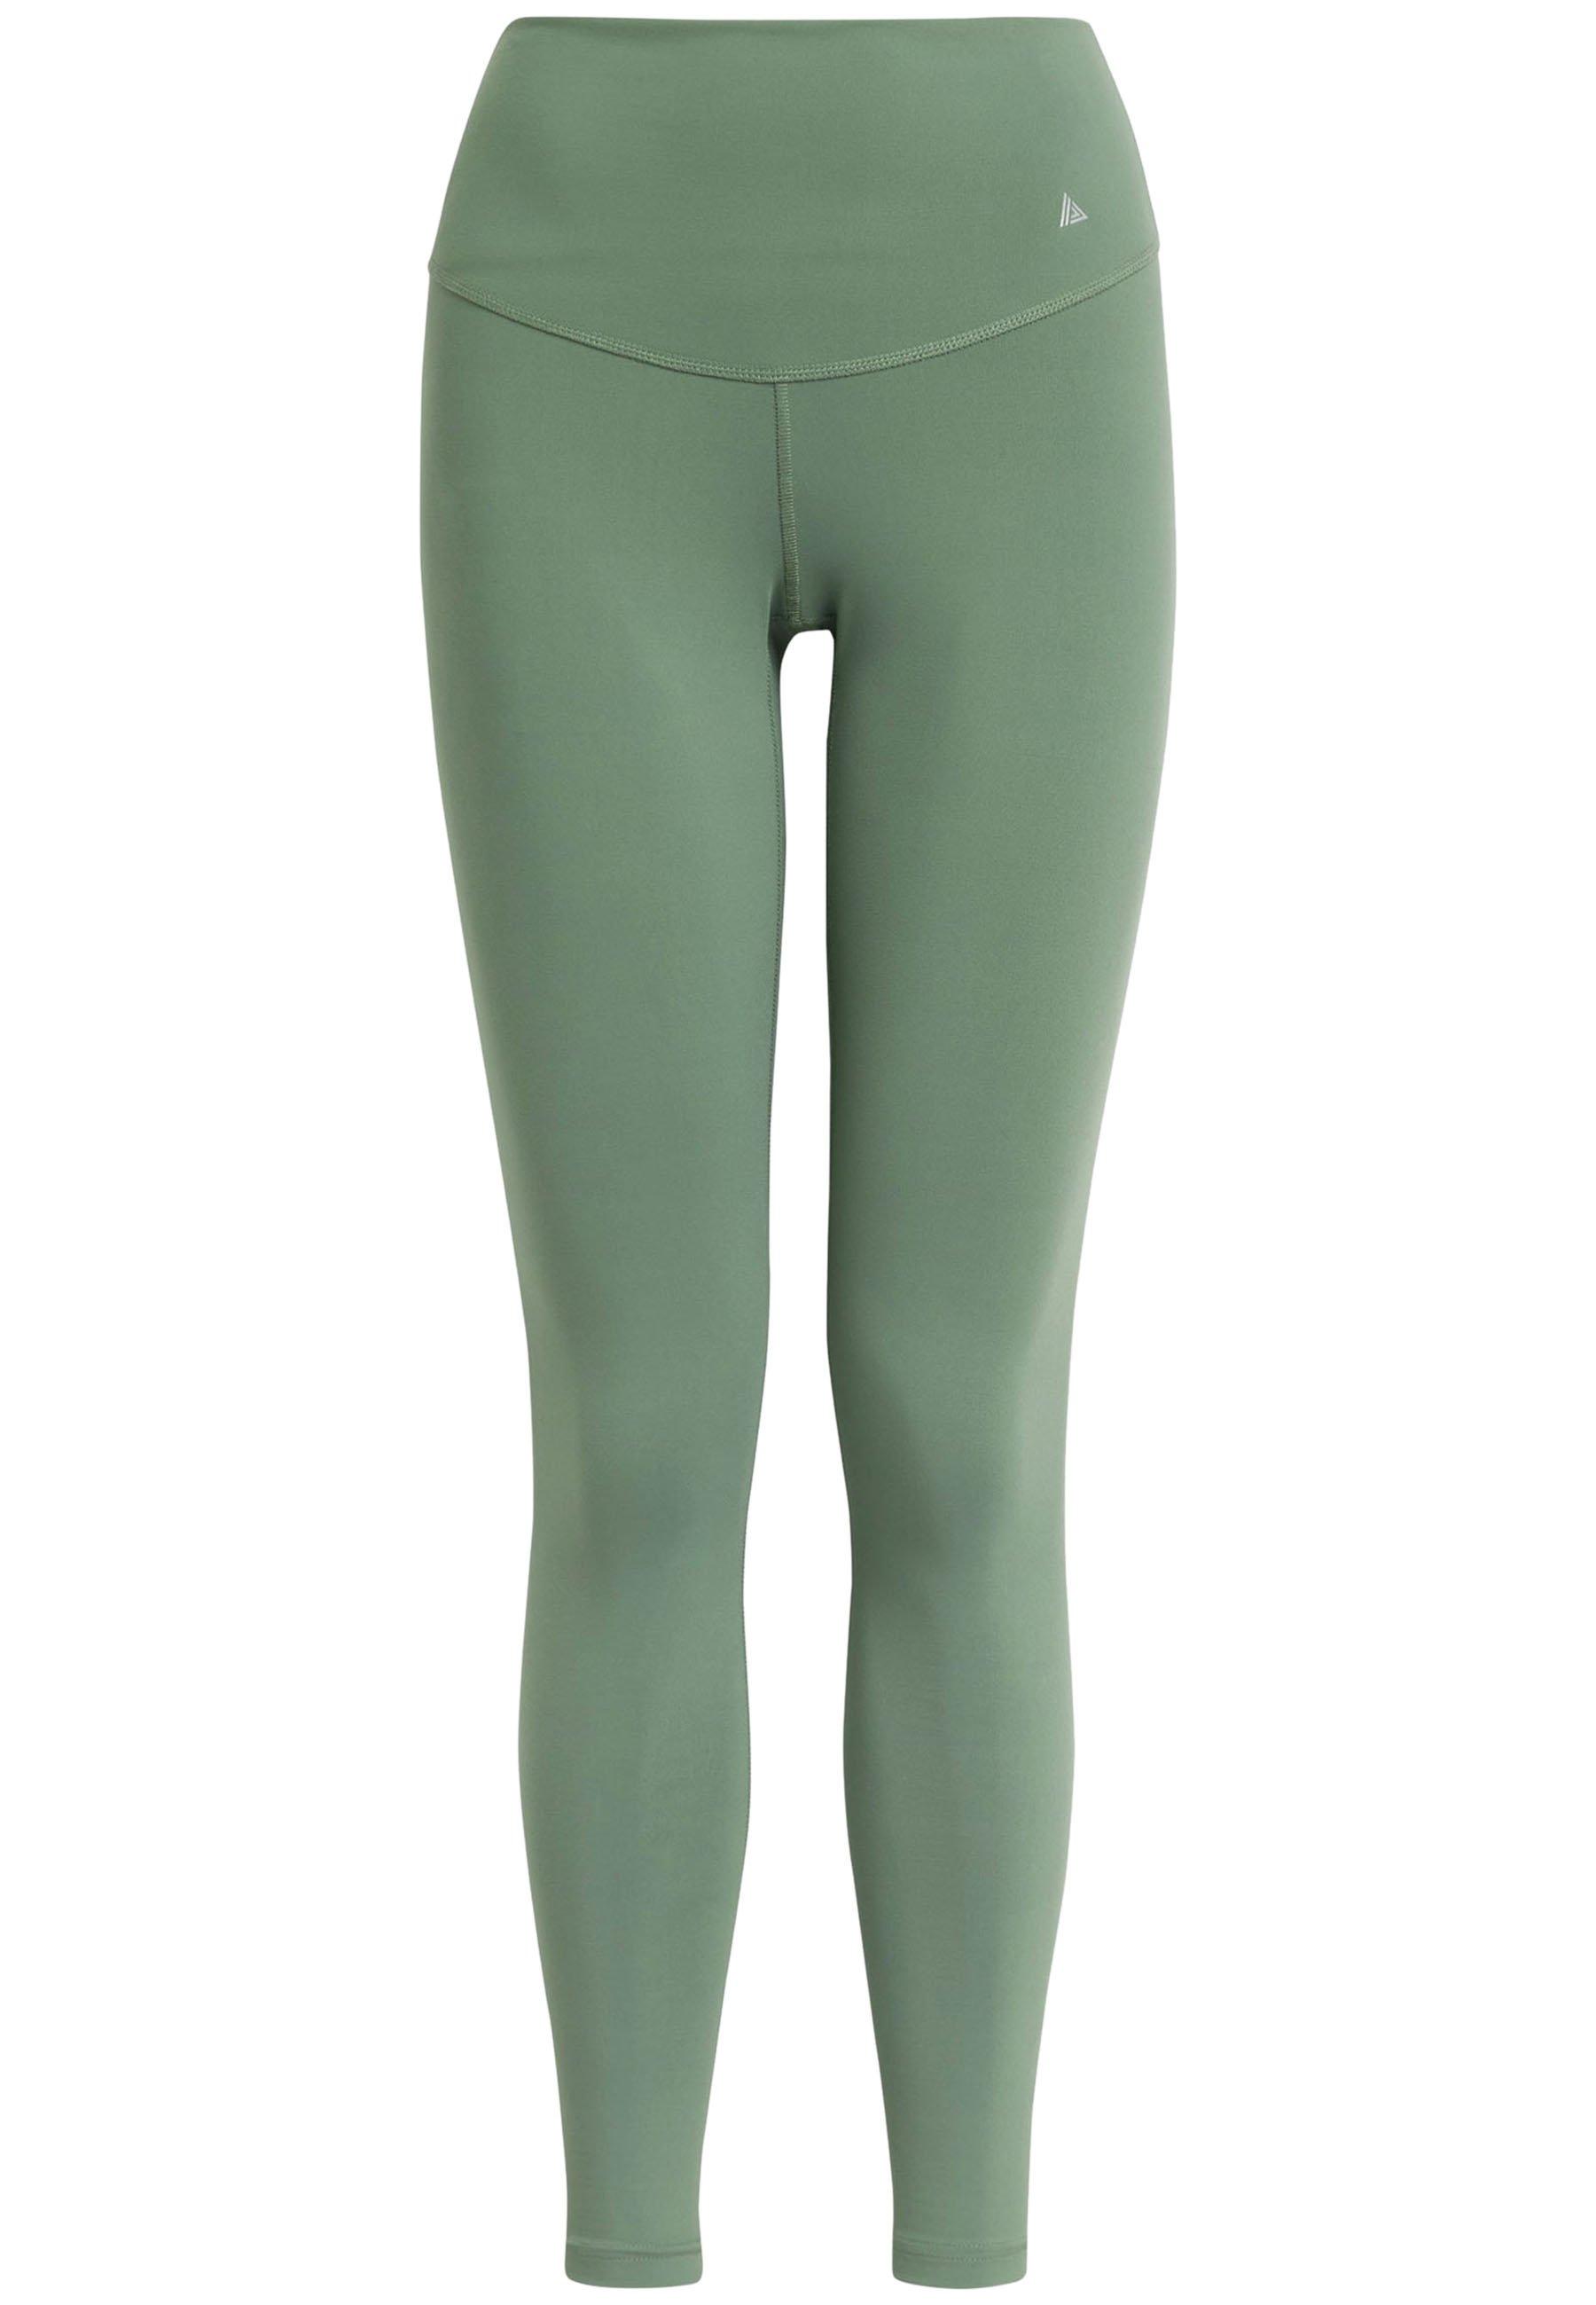 Damen SCULPTING  - Leggings - Hosen